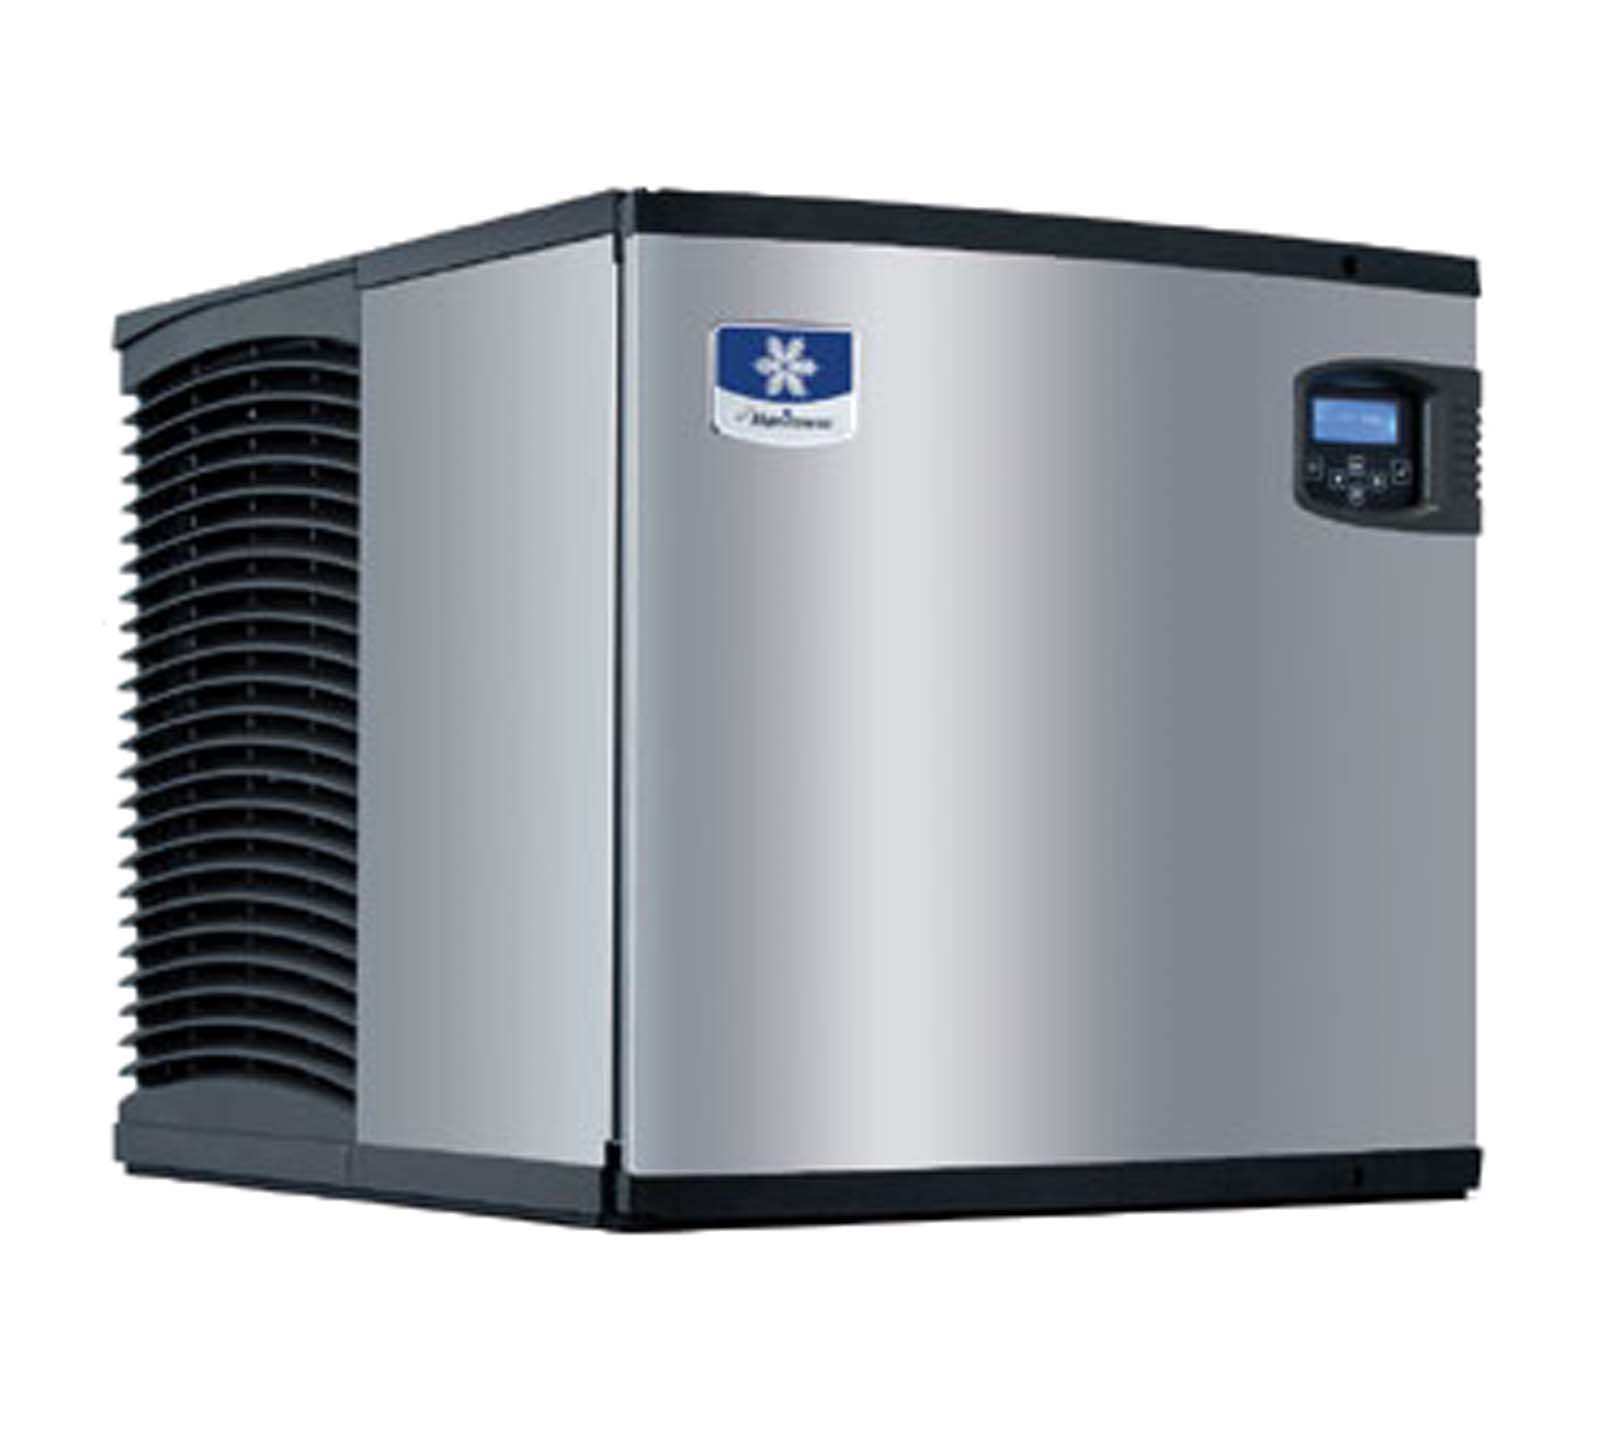 Manitowoc ID-0522A-SPA-160 475 Lb Air-Cooled Full Cube Ice Machine w/ SPA-160 Hotel Dispenser